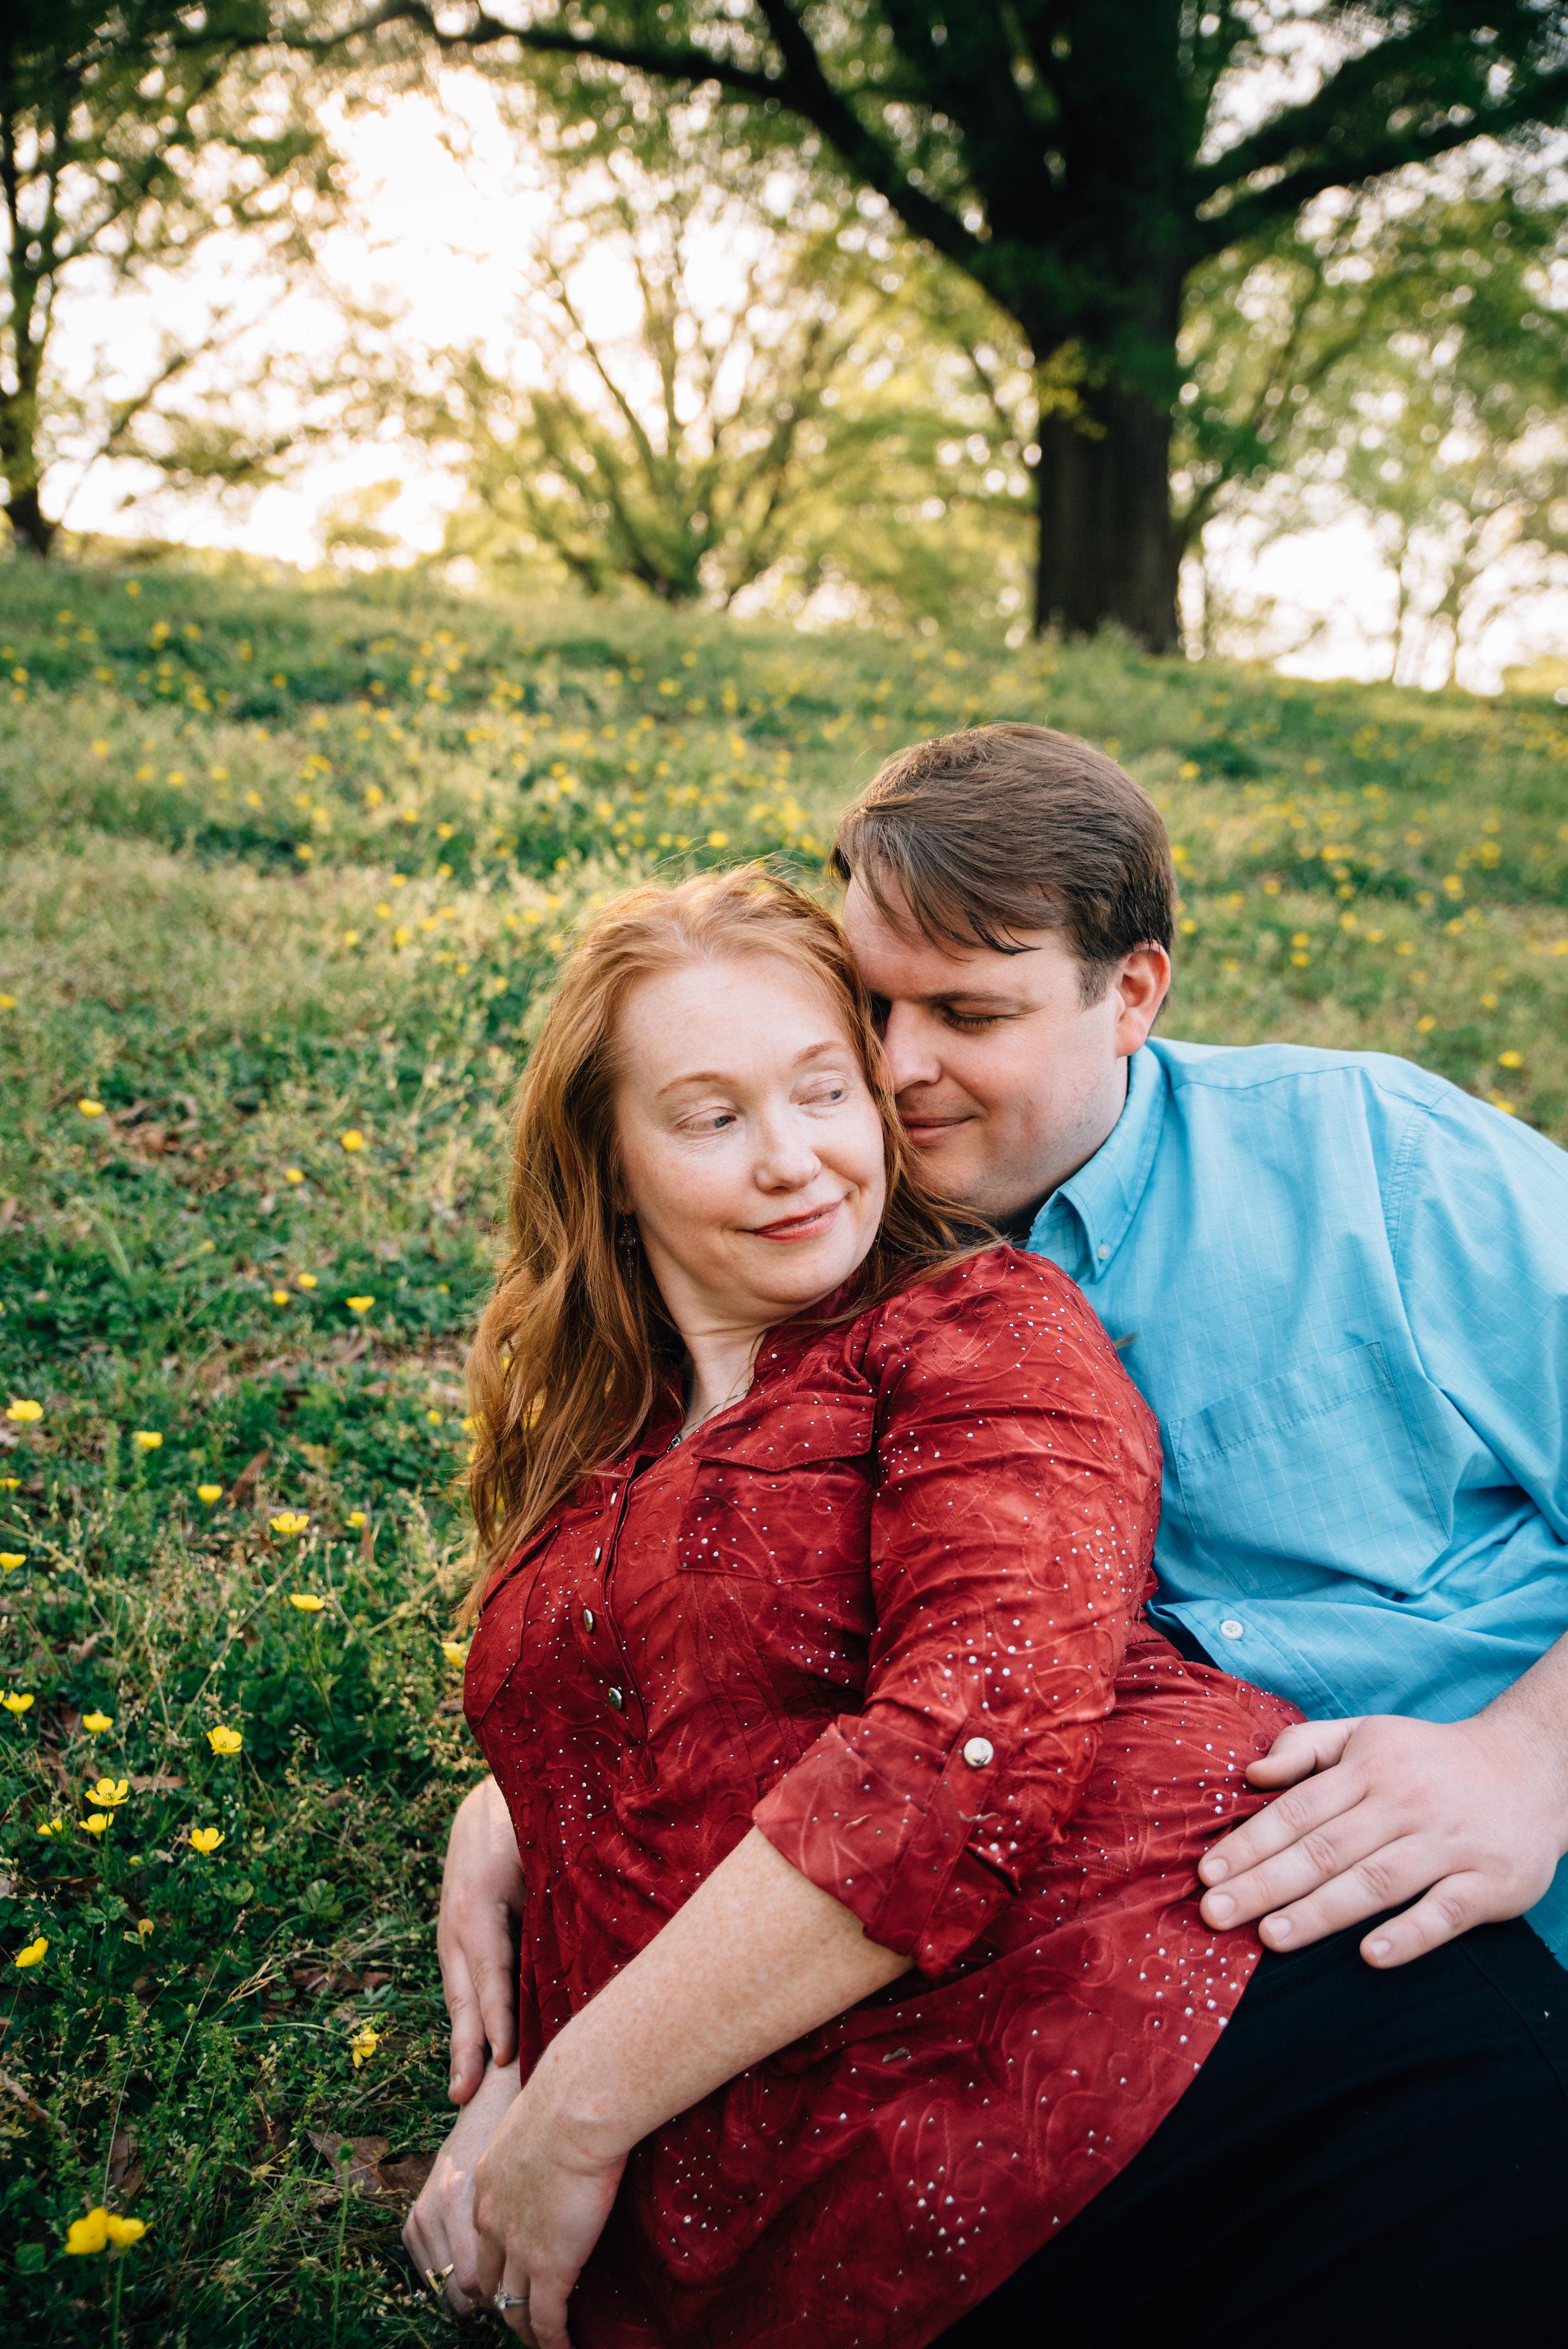 Dorothea Dix Park - Raleigh Wedding Photographer - North Carolina Wedding Photographer